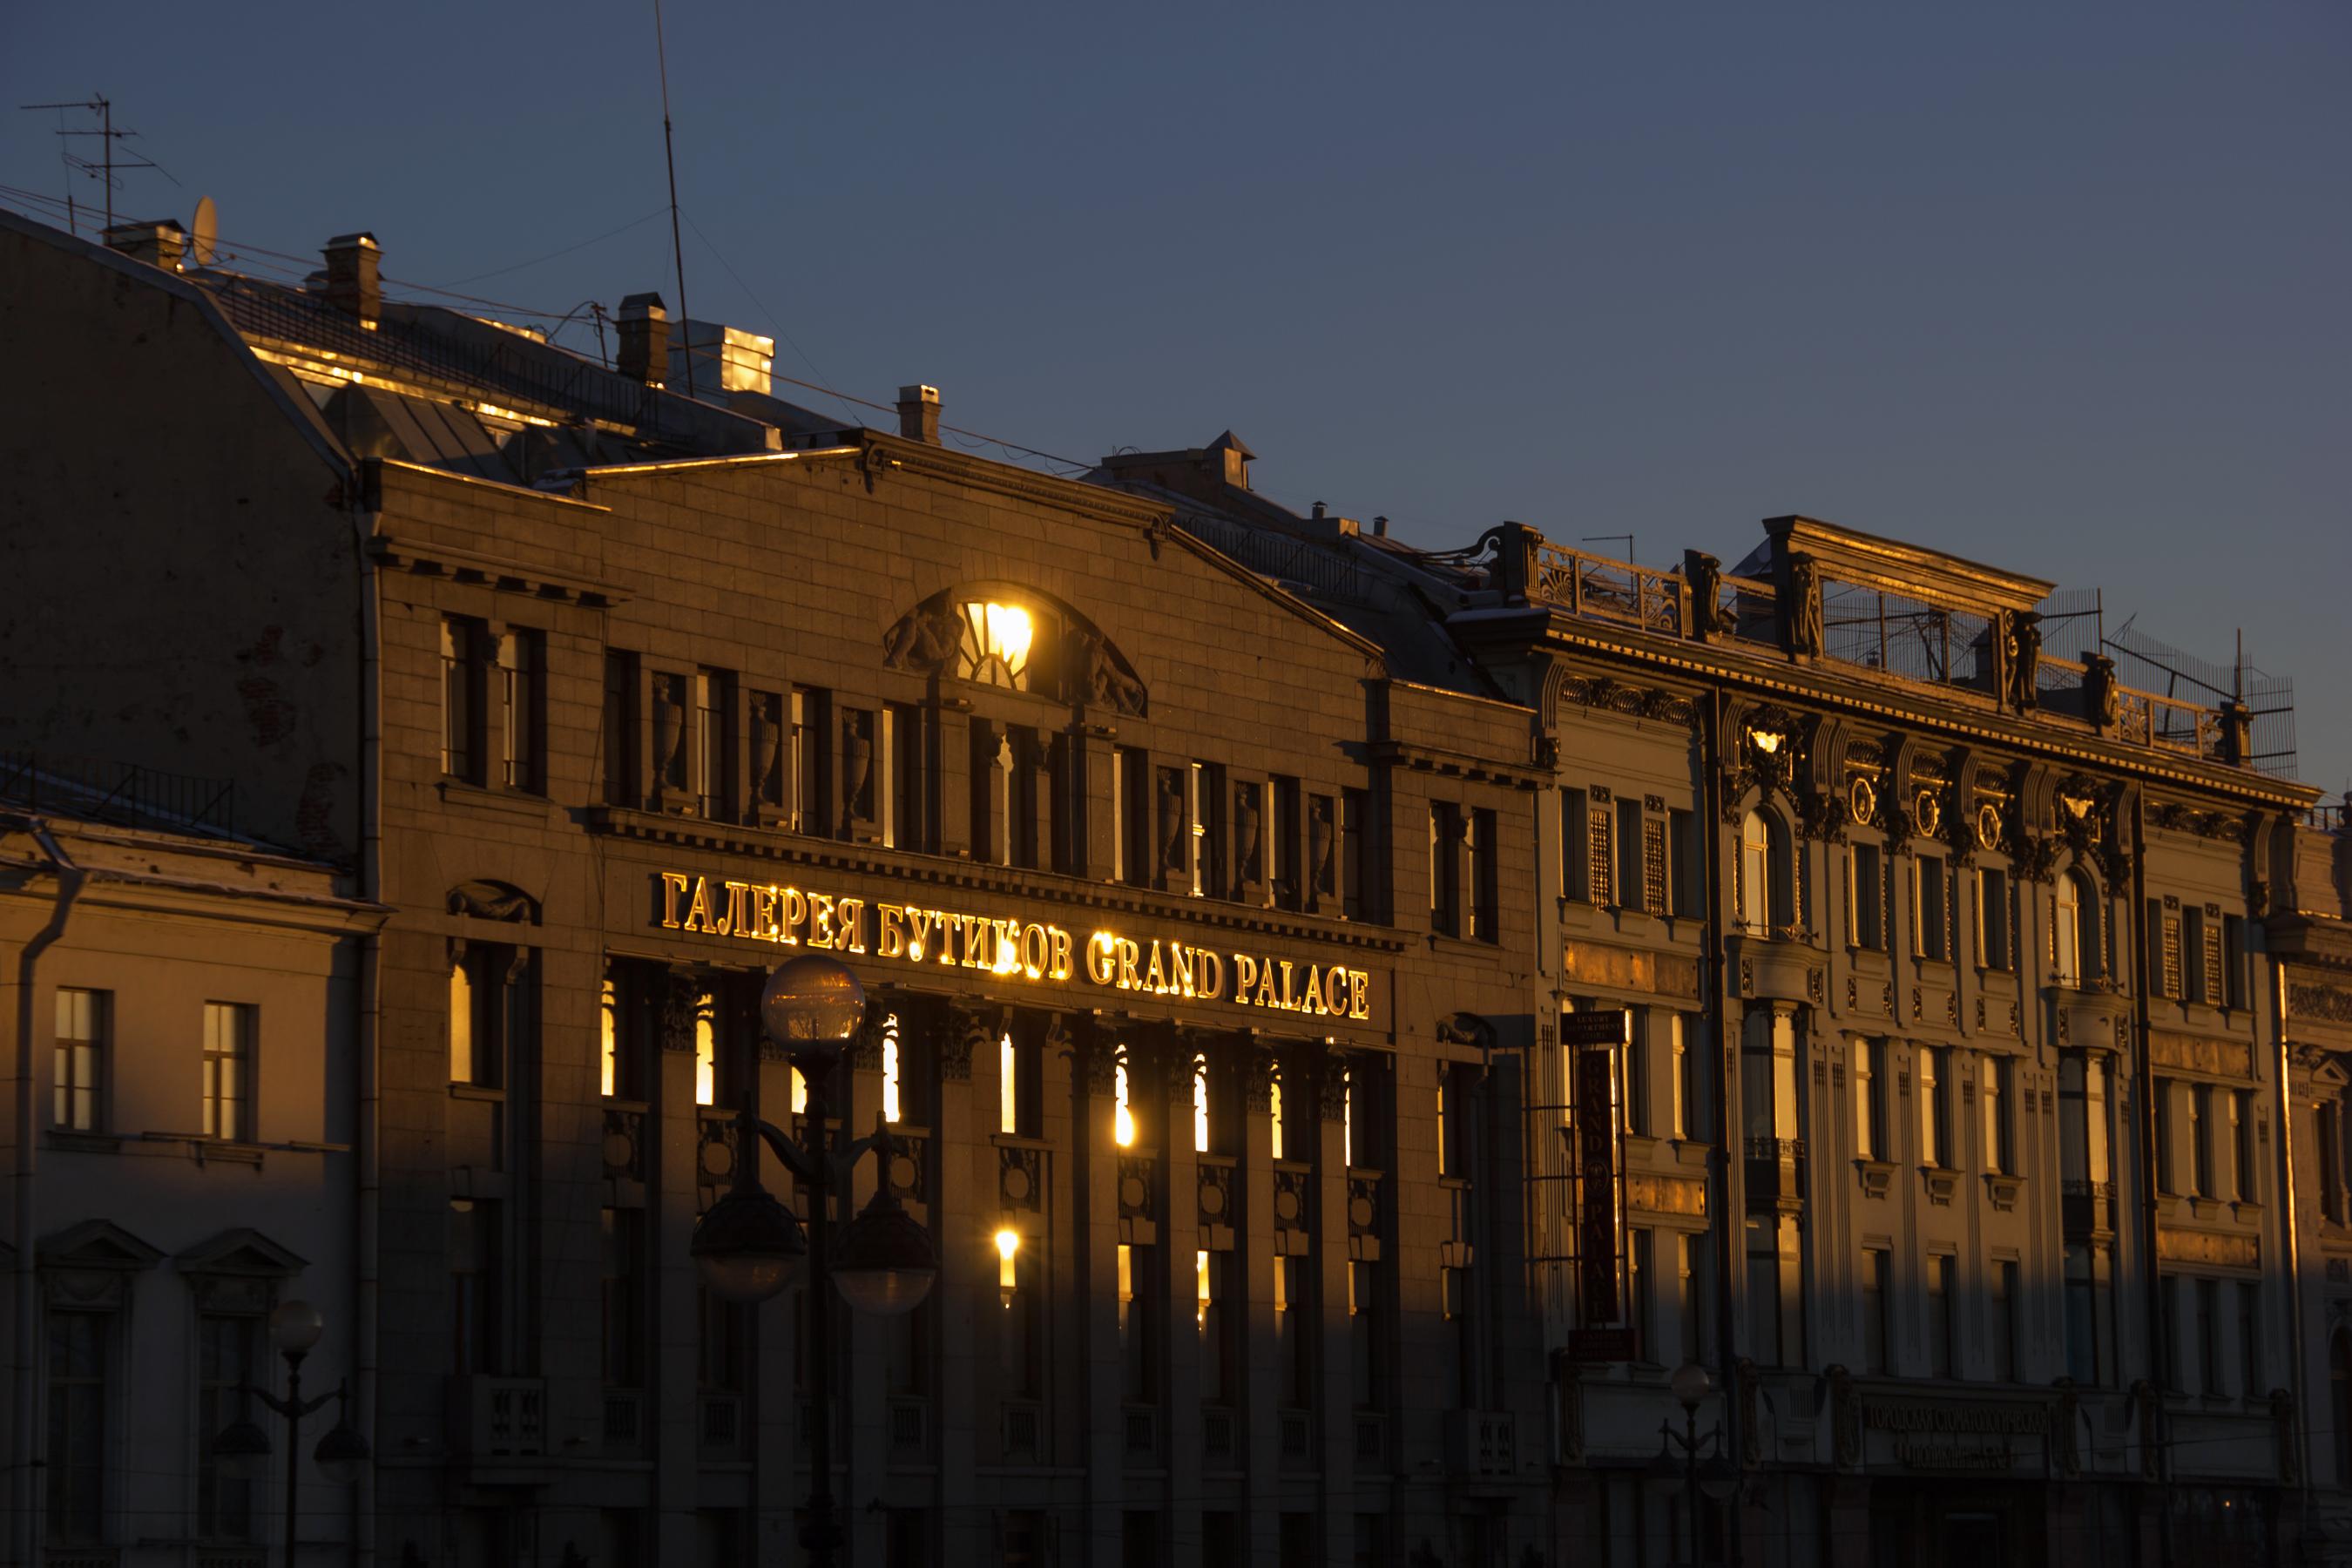 Petersburg photo